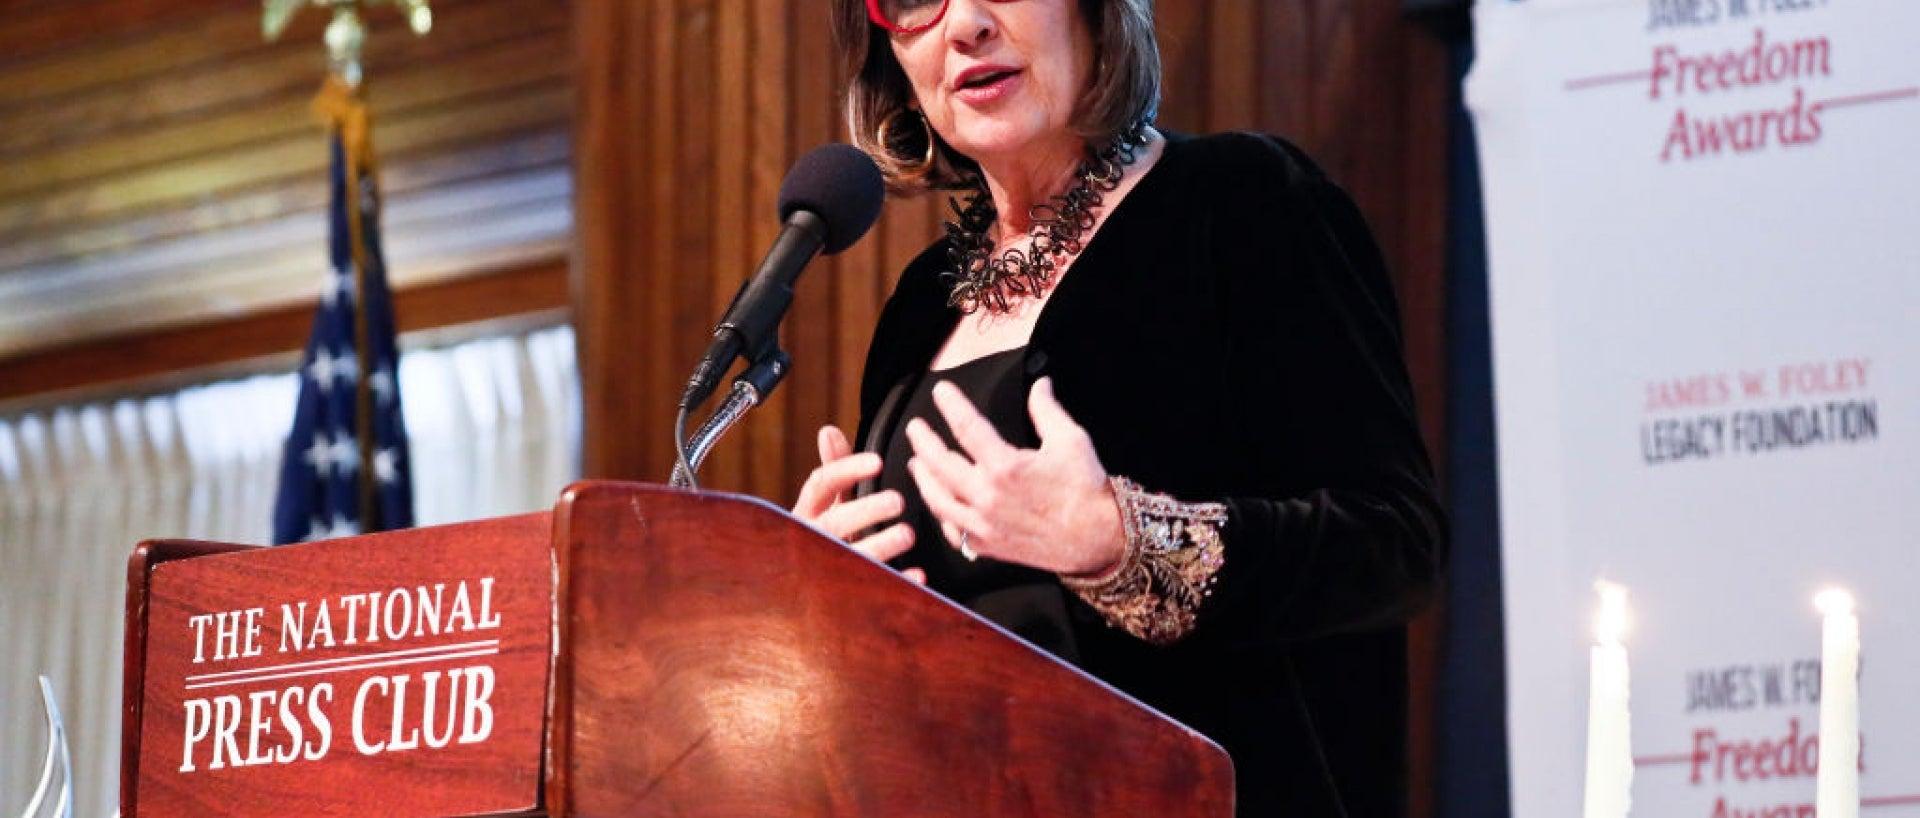 Christiane Amanpour standing at podium speaking